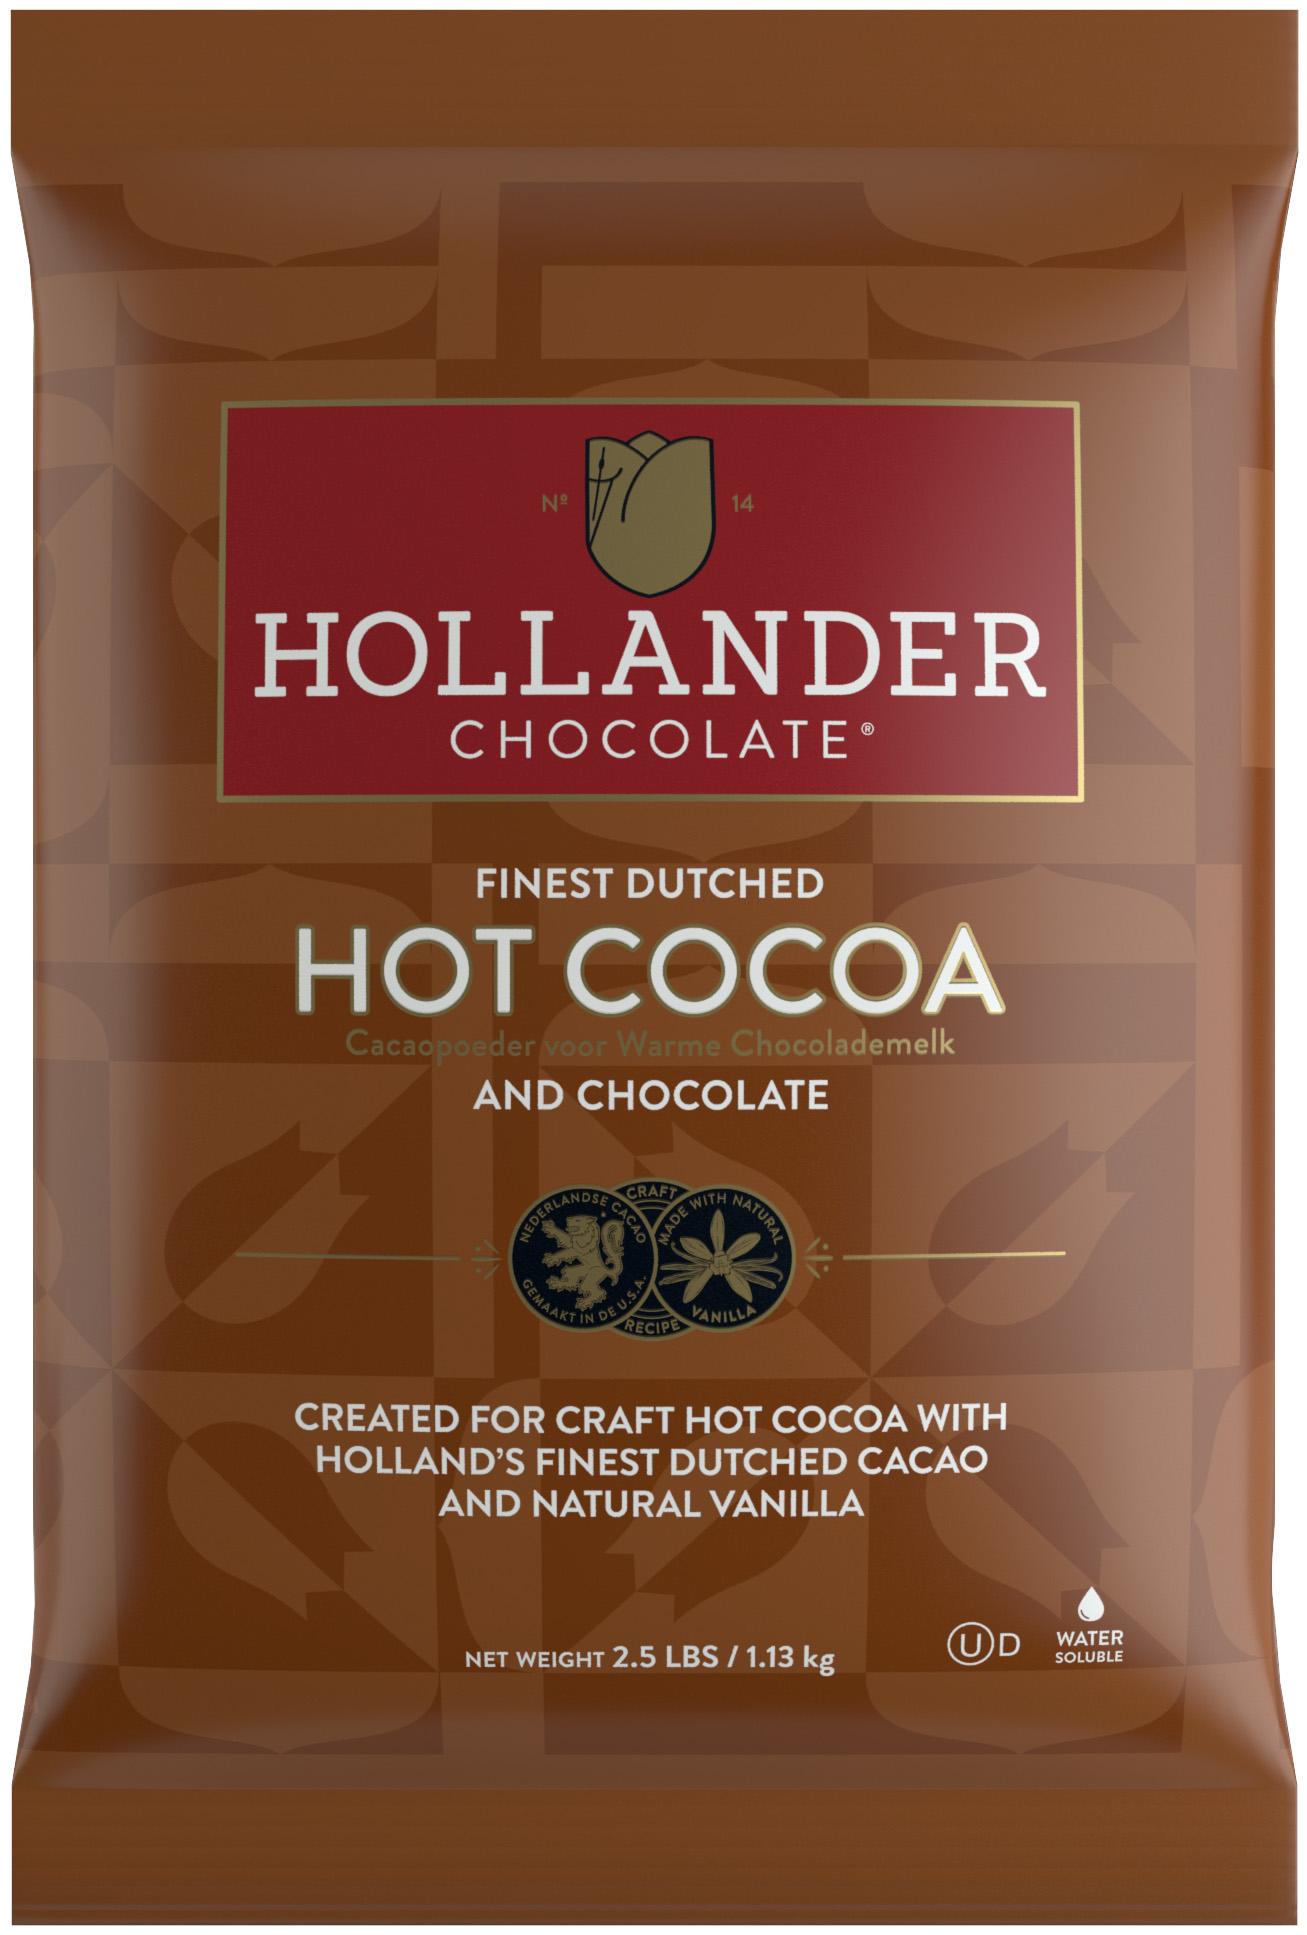 HOLLANDER - Hot Cocoa - Front.jpg